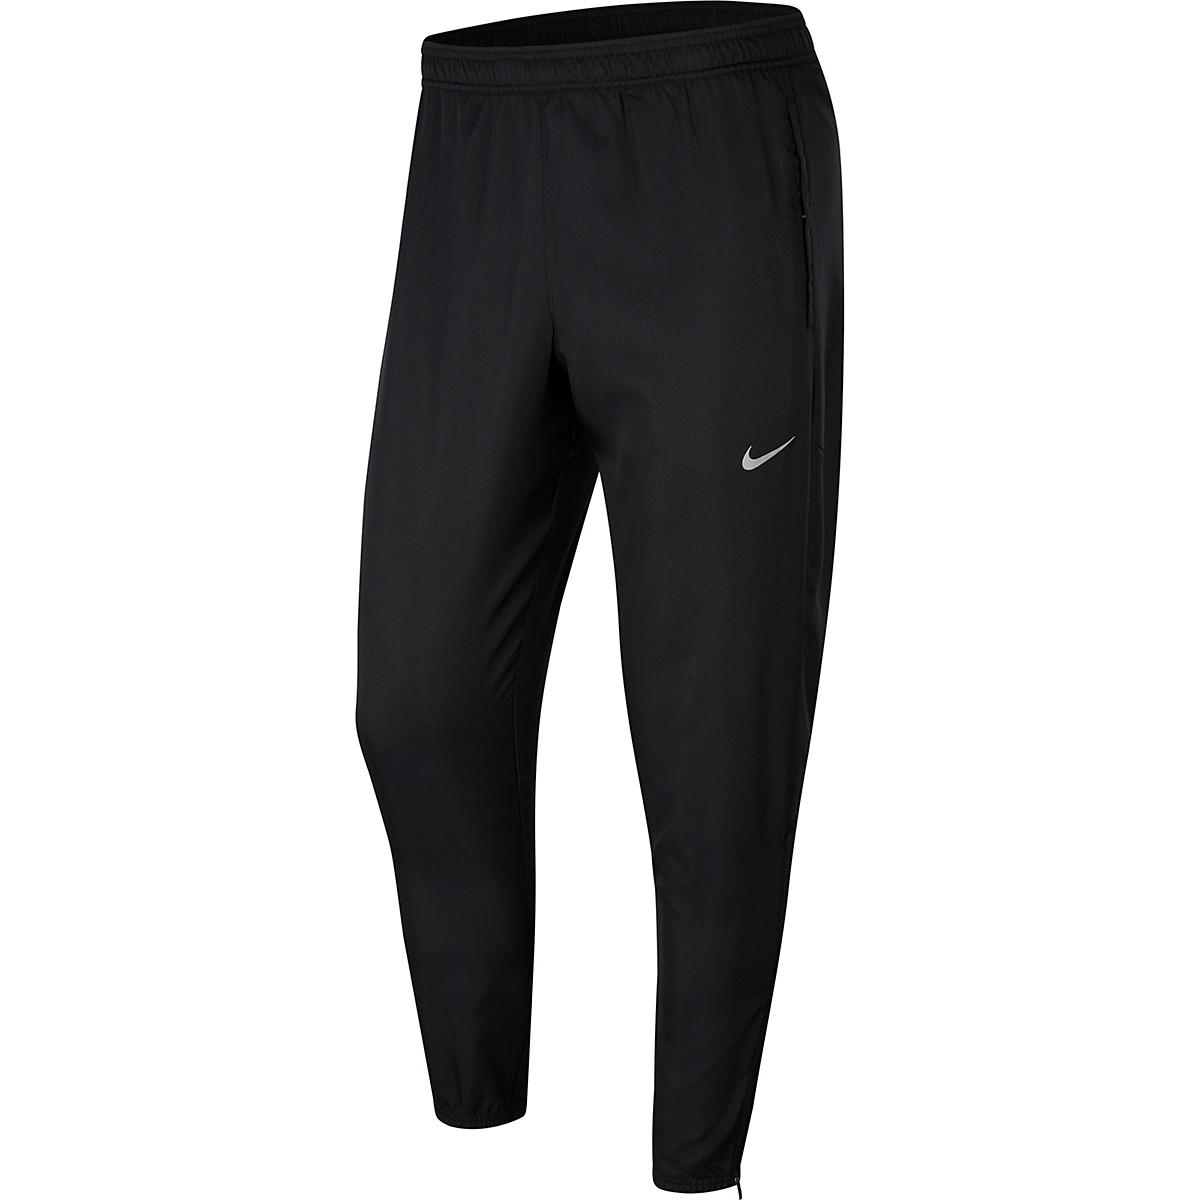 Sinfonía Cintura perrito  Men's Nike Essential Woven Running Pants   JackRabbit